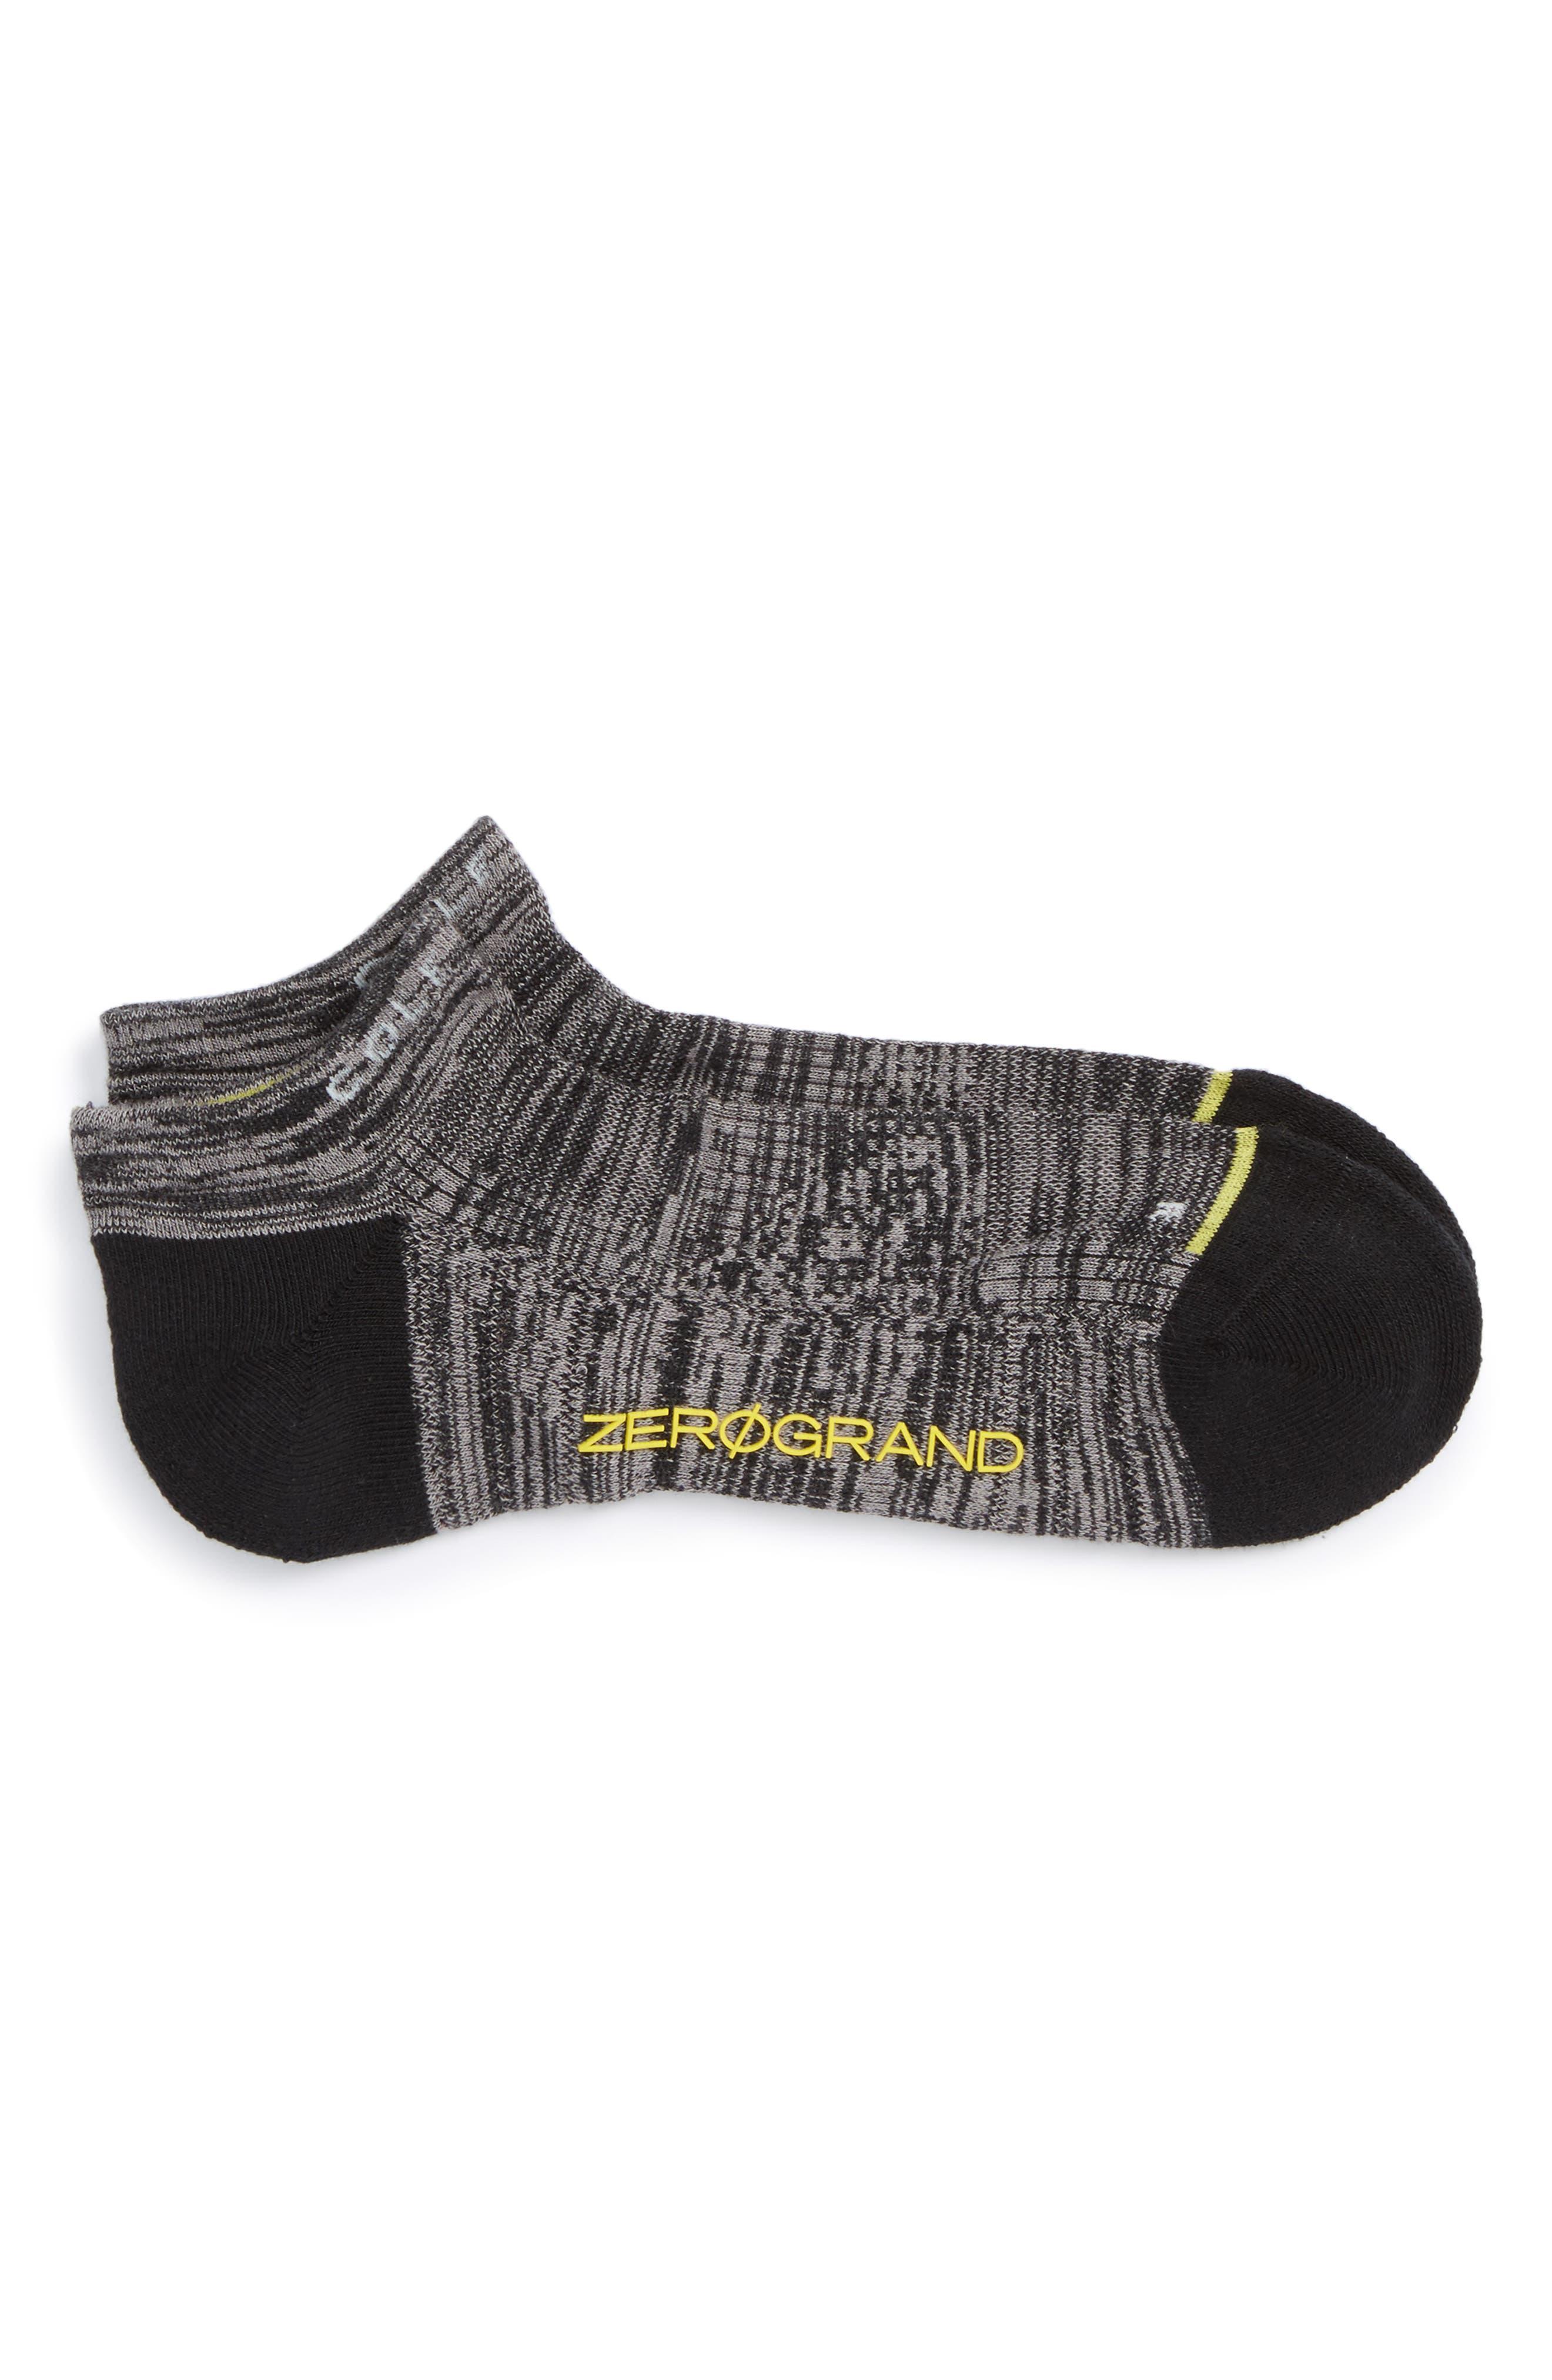 Main Image - Cole Haan ZeroGrand Liner Socks